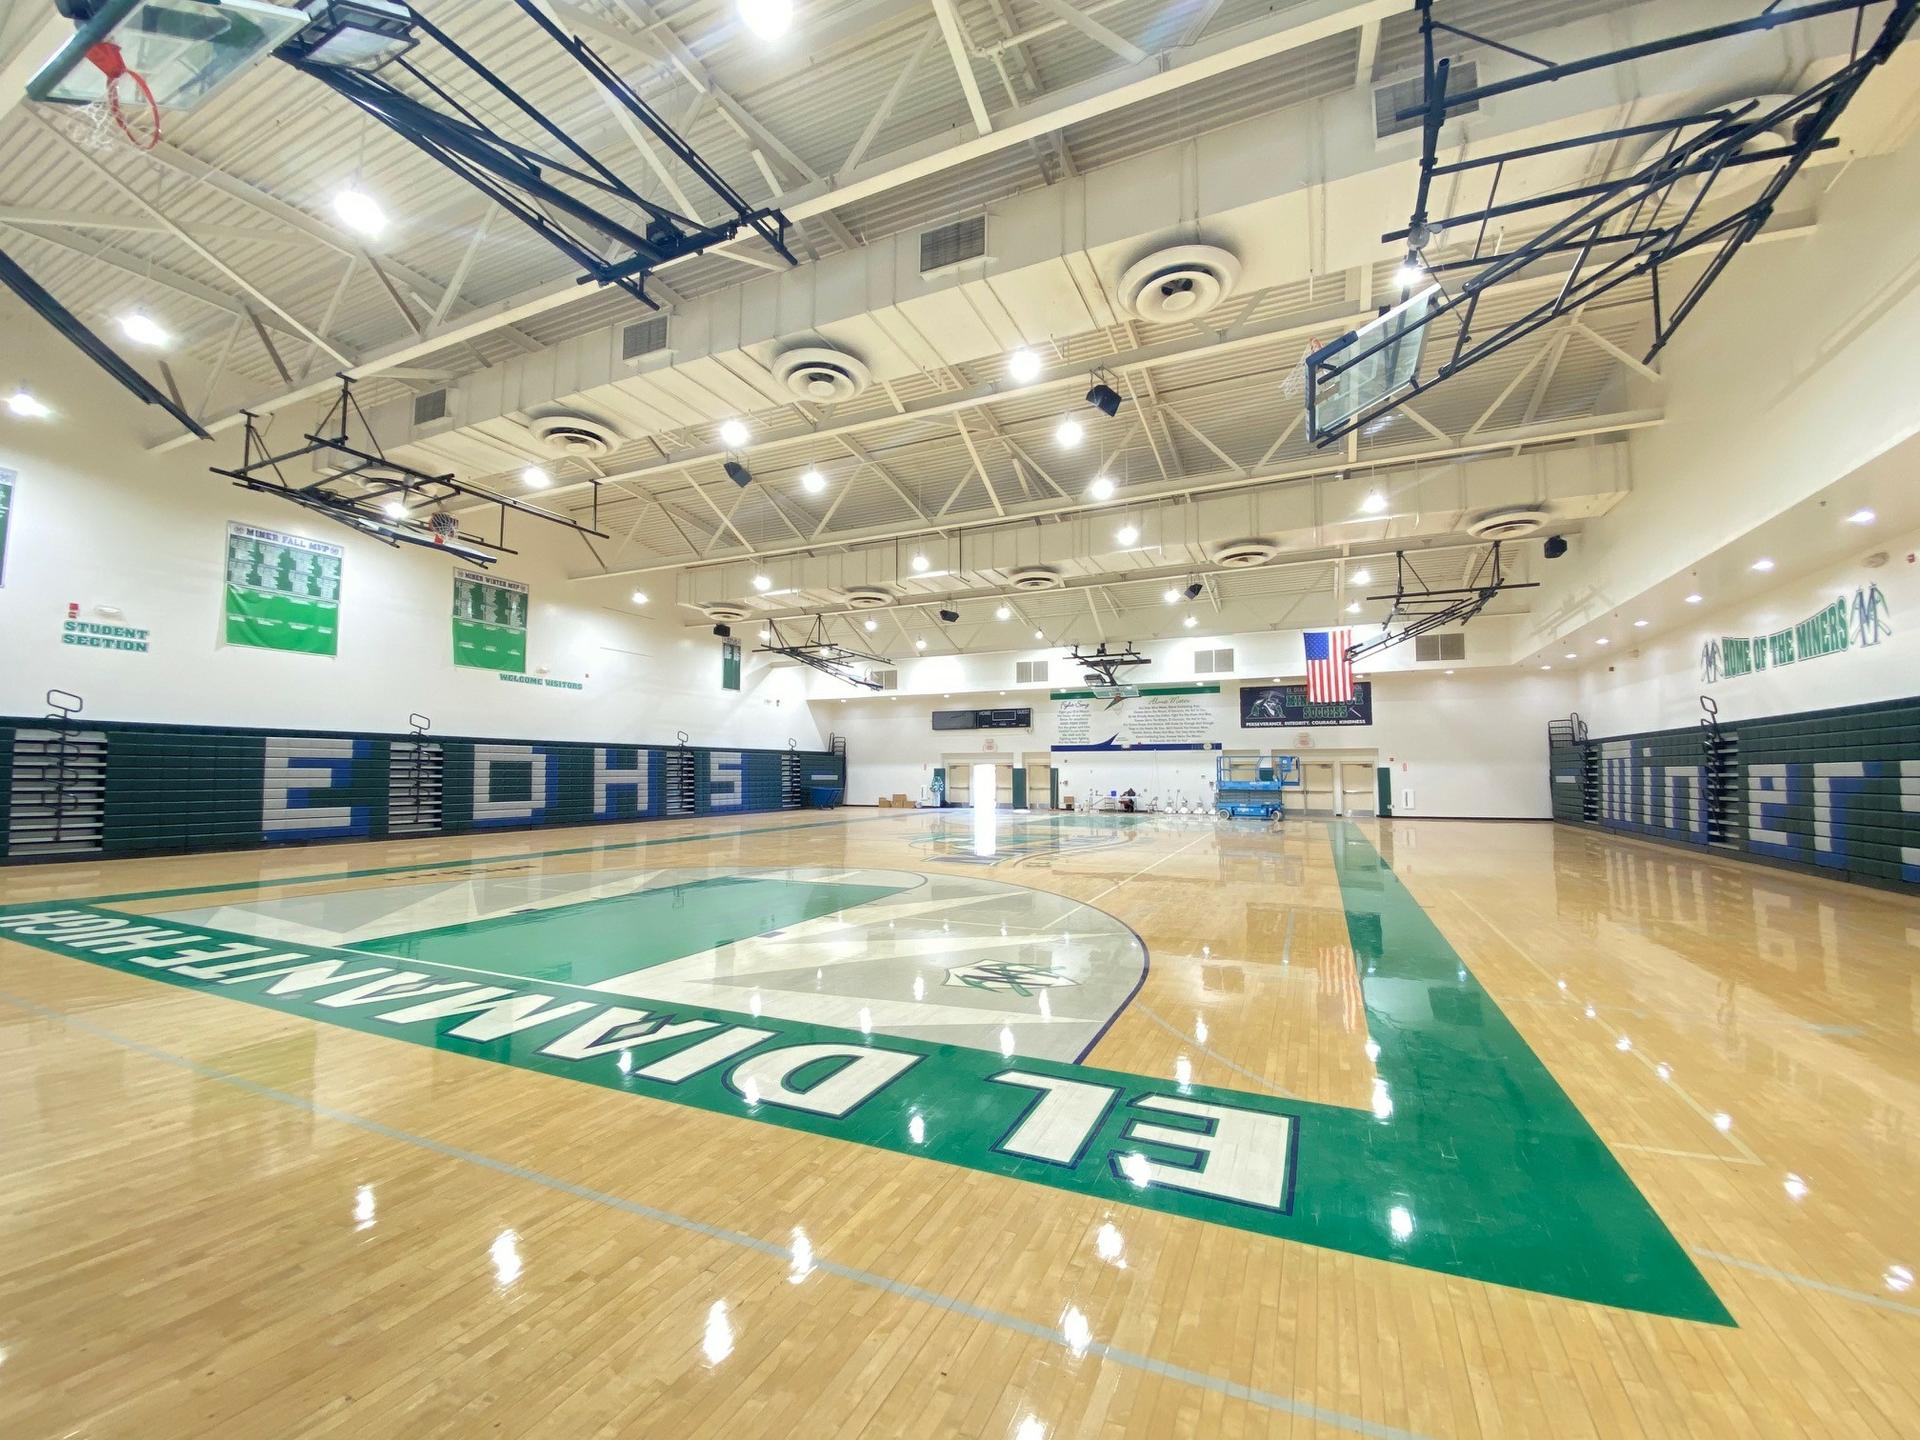 El Diamante High School's gym following the latest lighting upgrade.